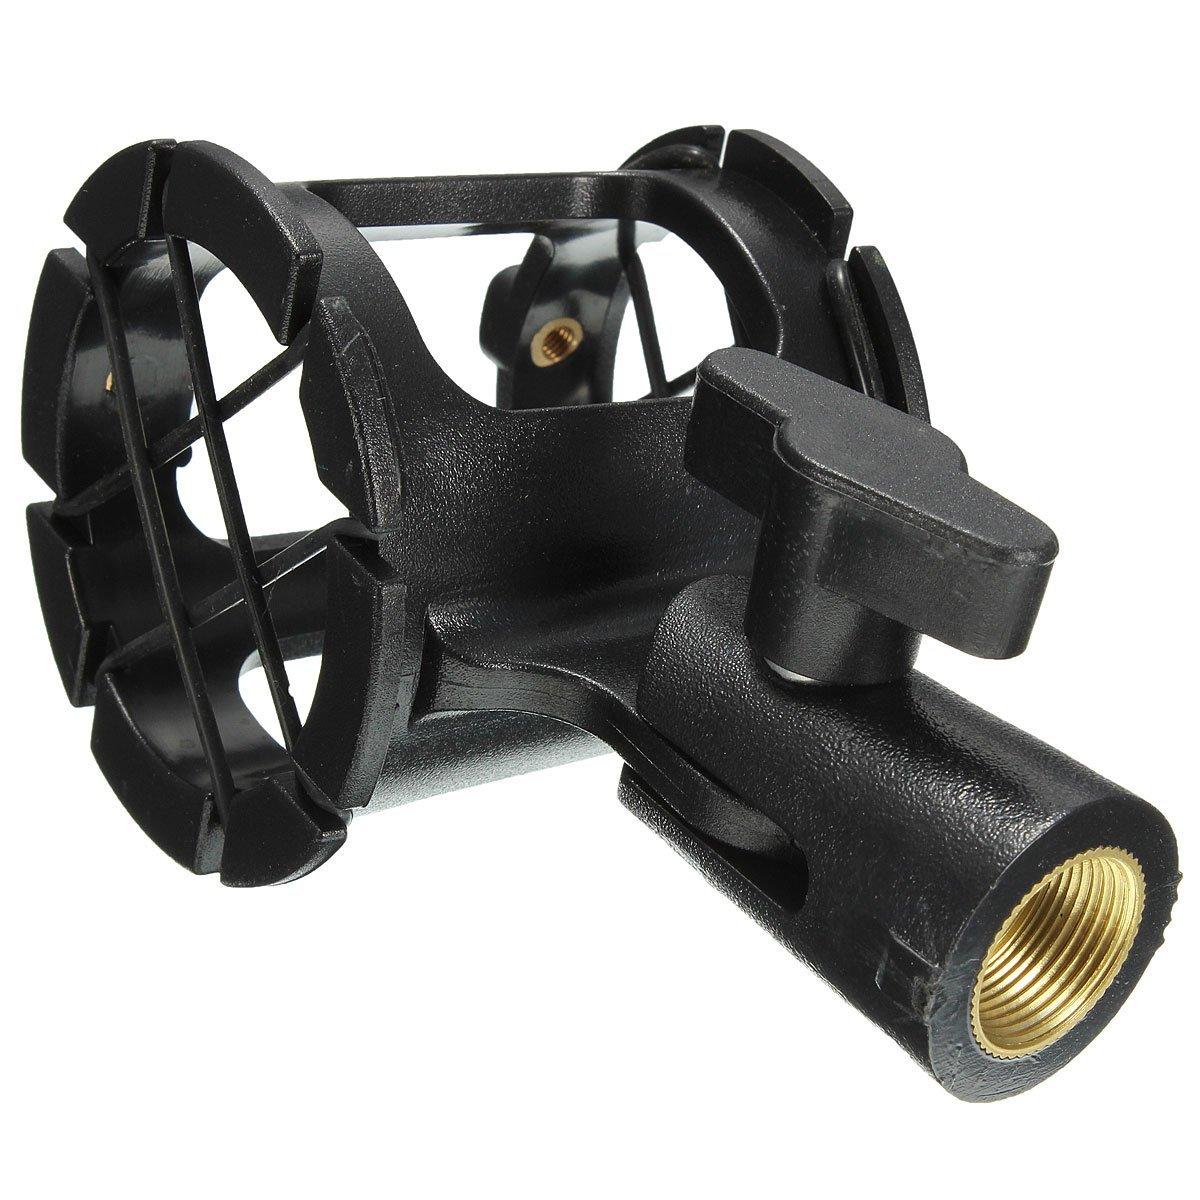 Microphone Shock mount - SODIAL(R) Shockmount Shock mount shotgun microphone suspension bracket for large diaphragm 044506